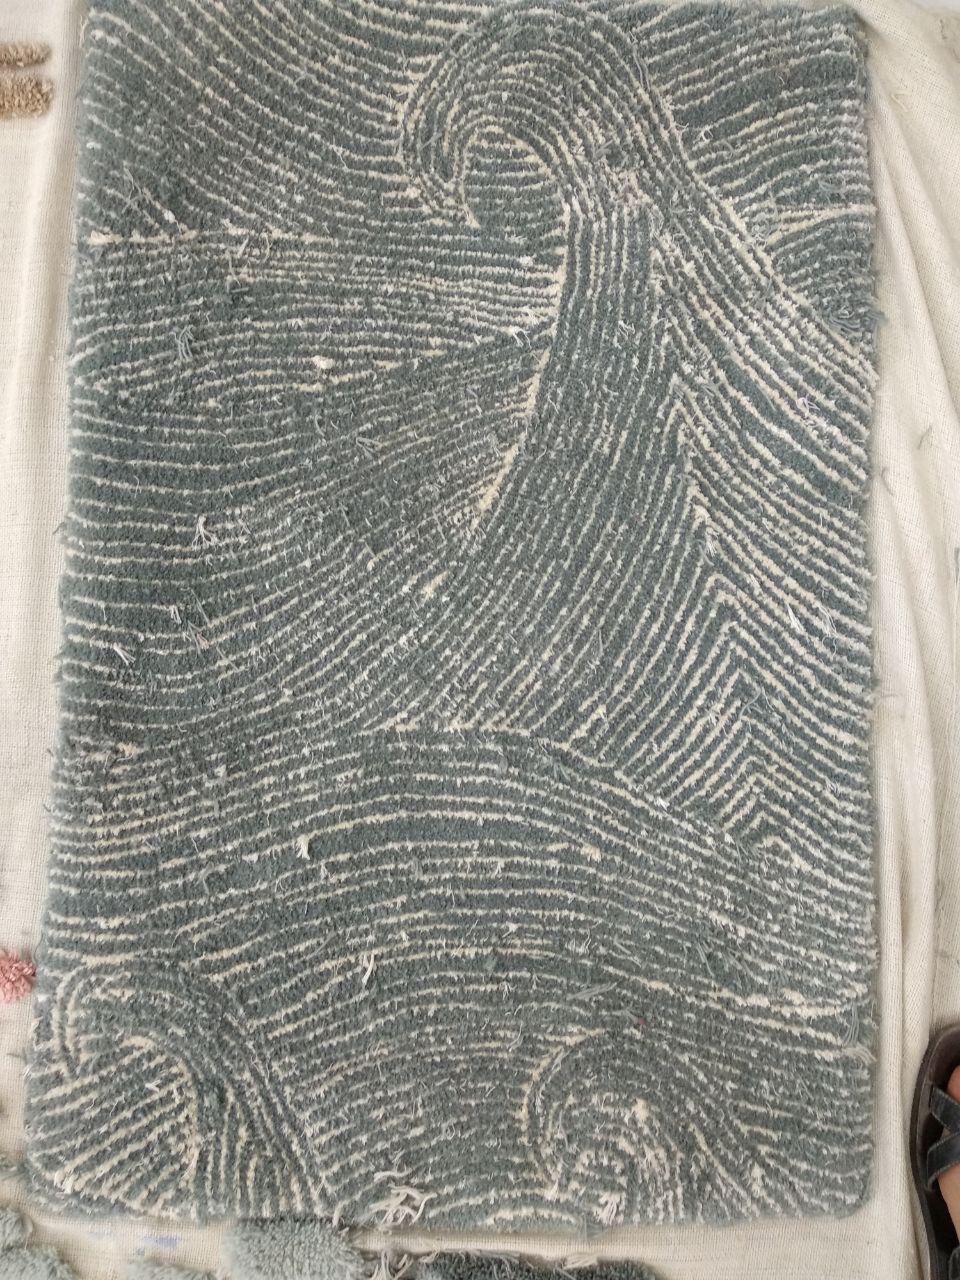 Seascape in Dusk rug sample before being trimmed